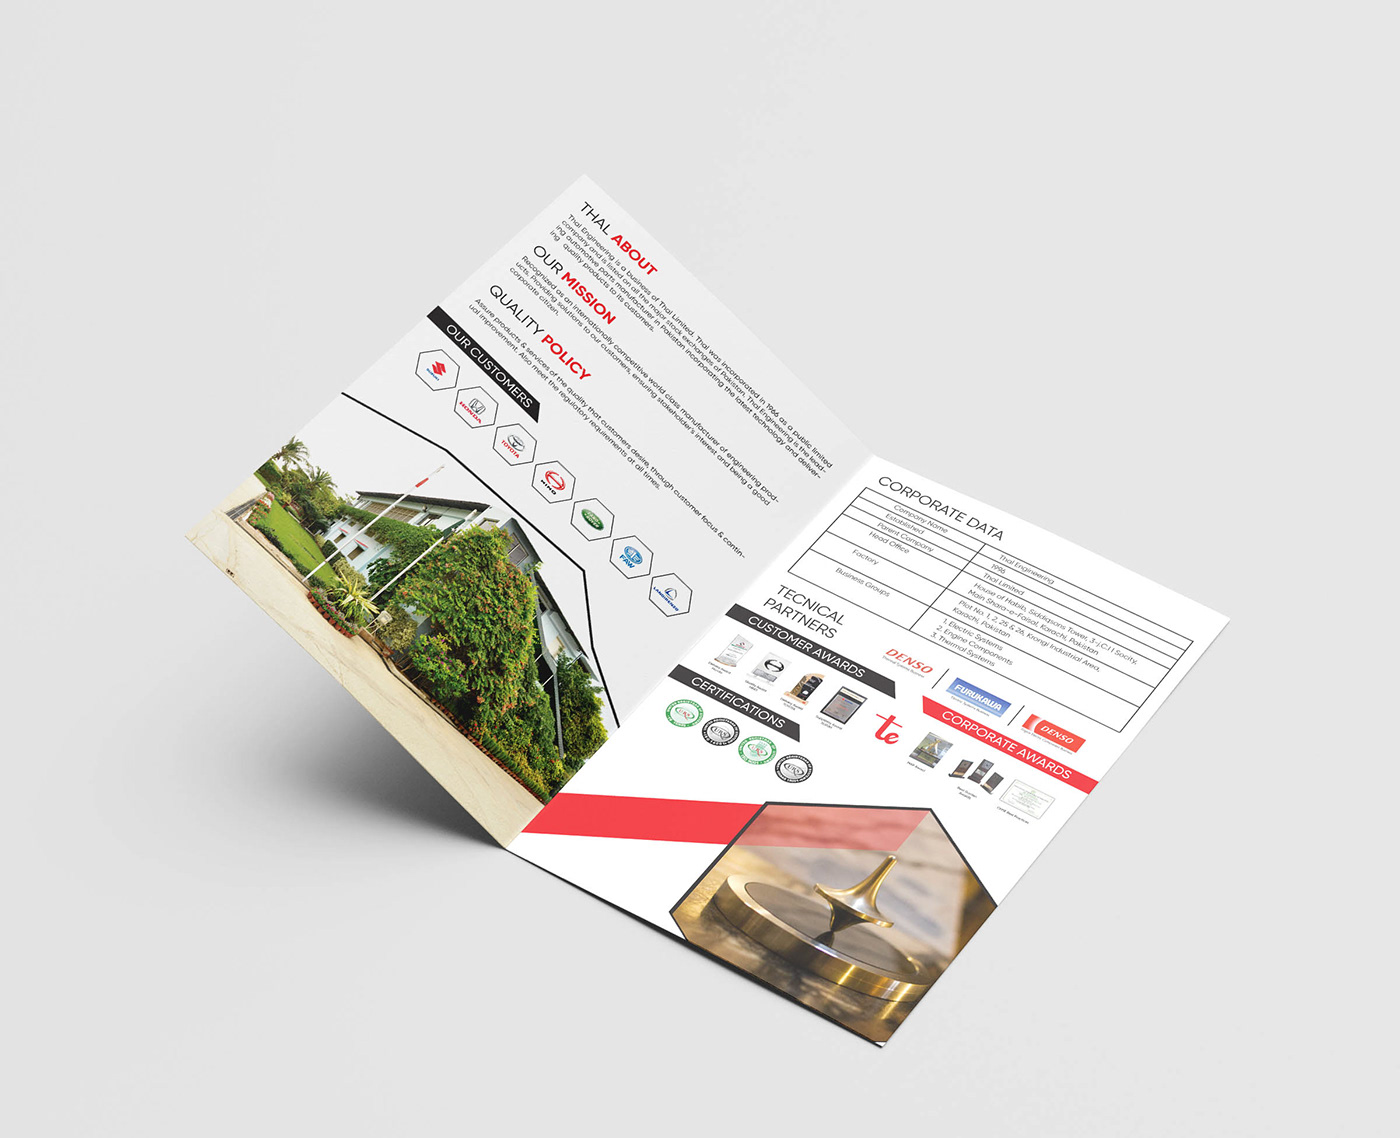 automotive   Broucher car broucher Engineering  fornt back leaflet design NABS nabs group Time Line